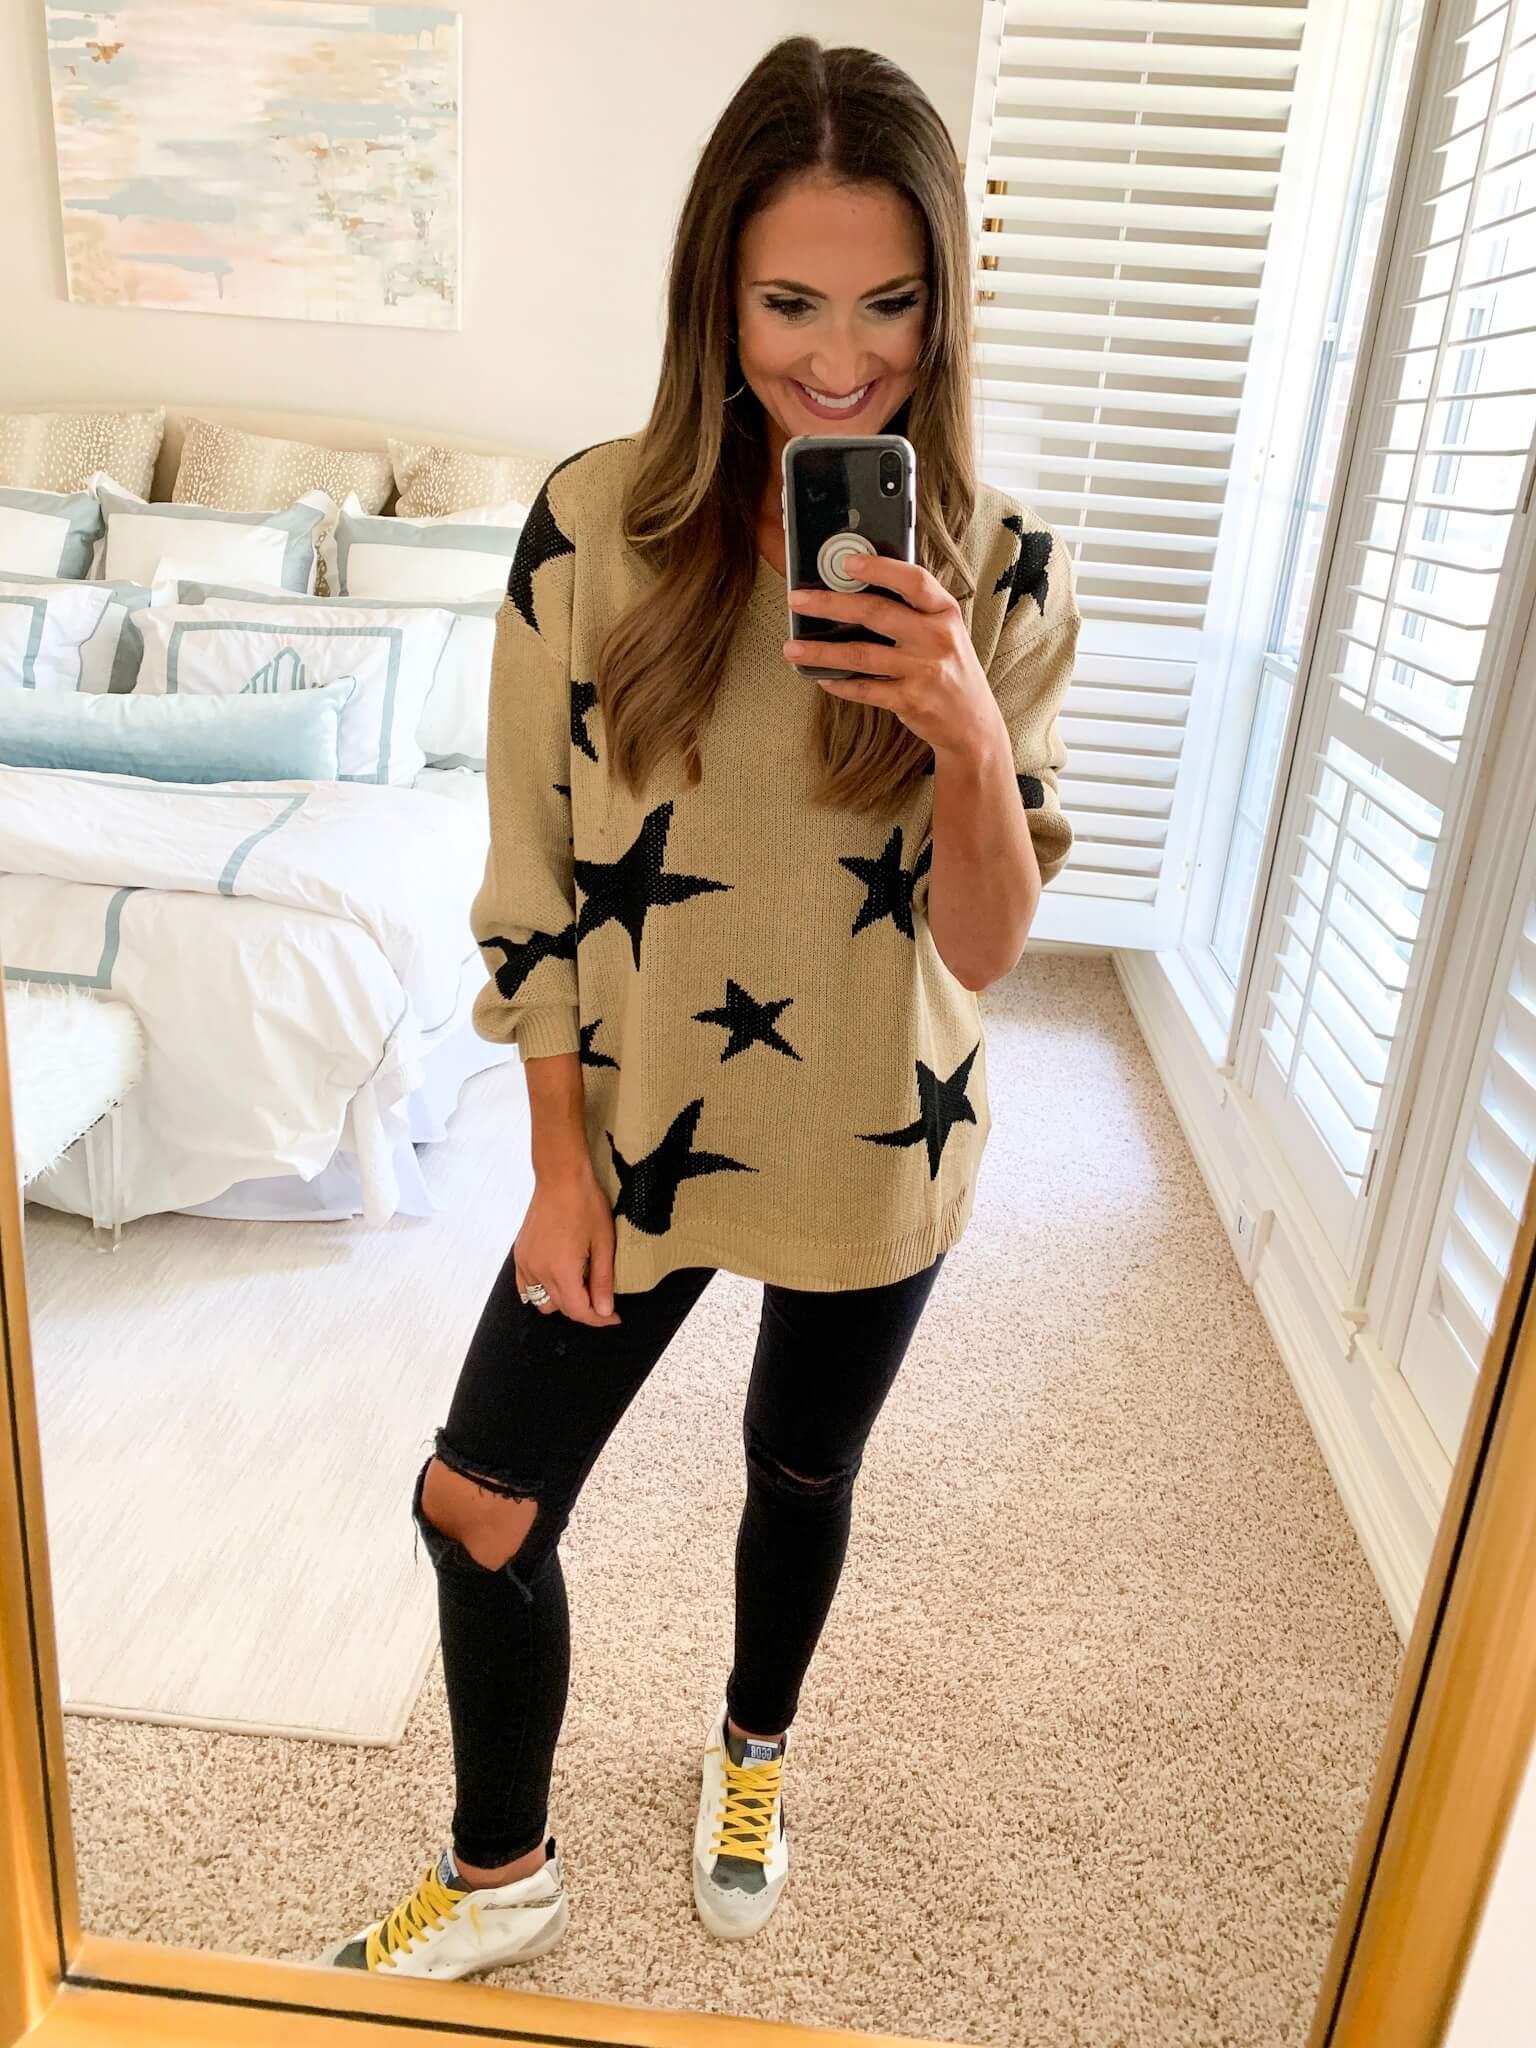 Amazon Fashion Haul | Style Your Senses | Amazon Prime haul | Star Sweater